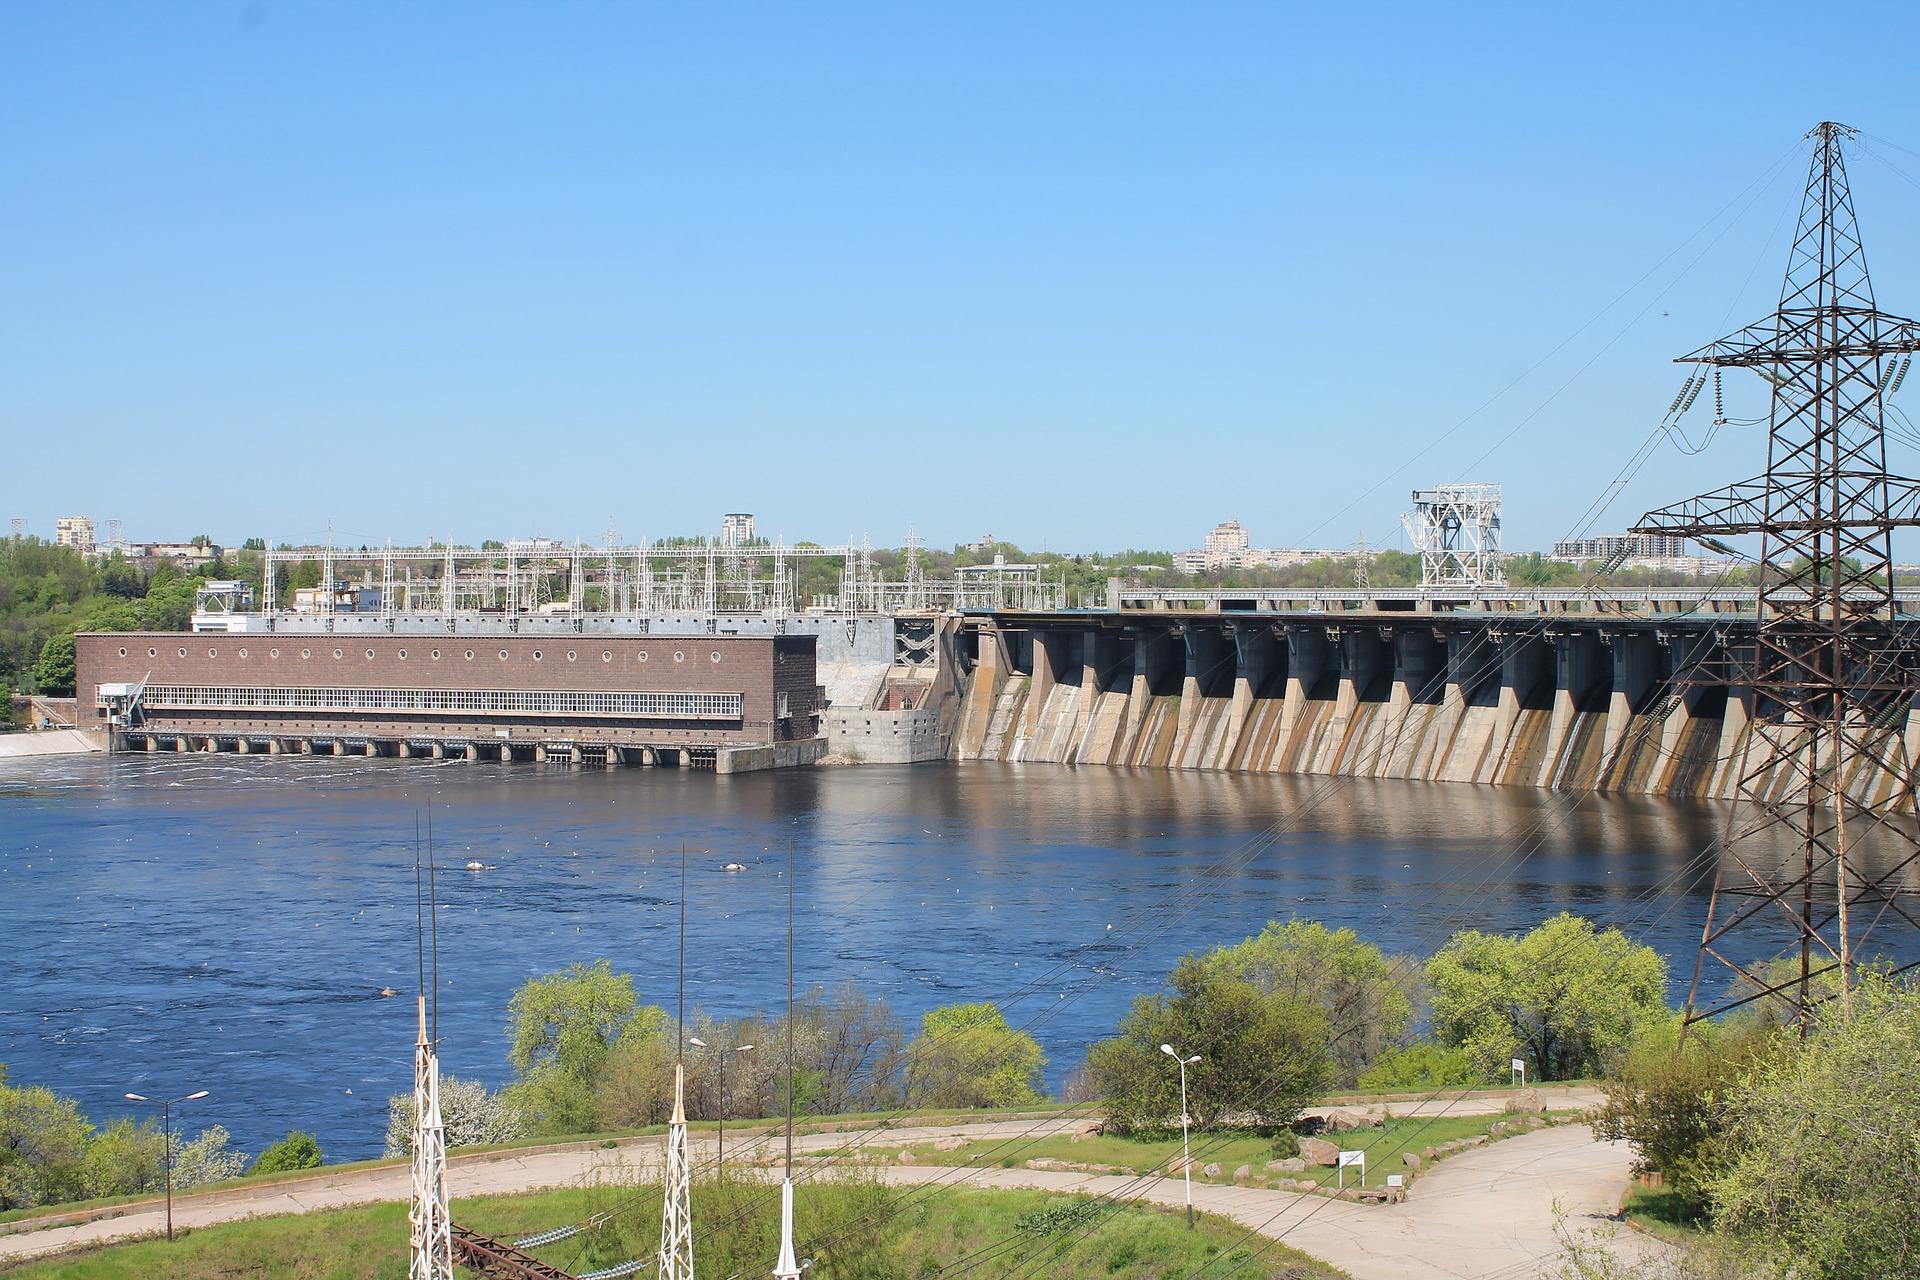 dam-3369500_1920.jpg